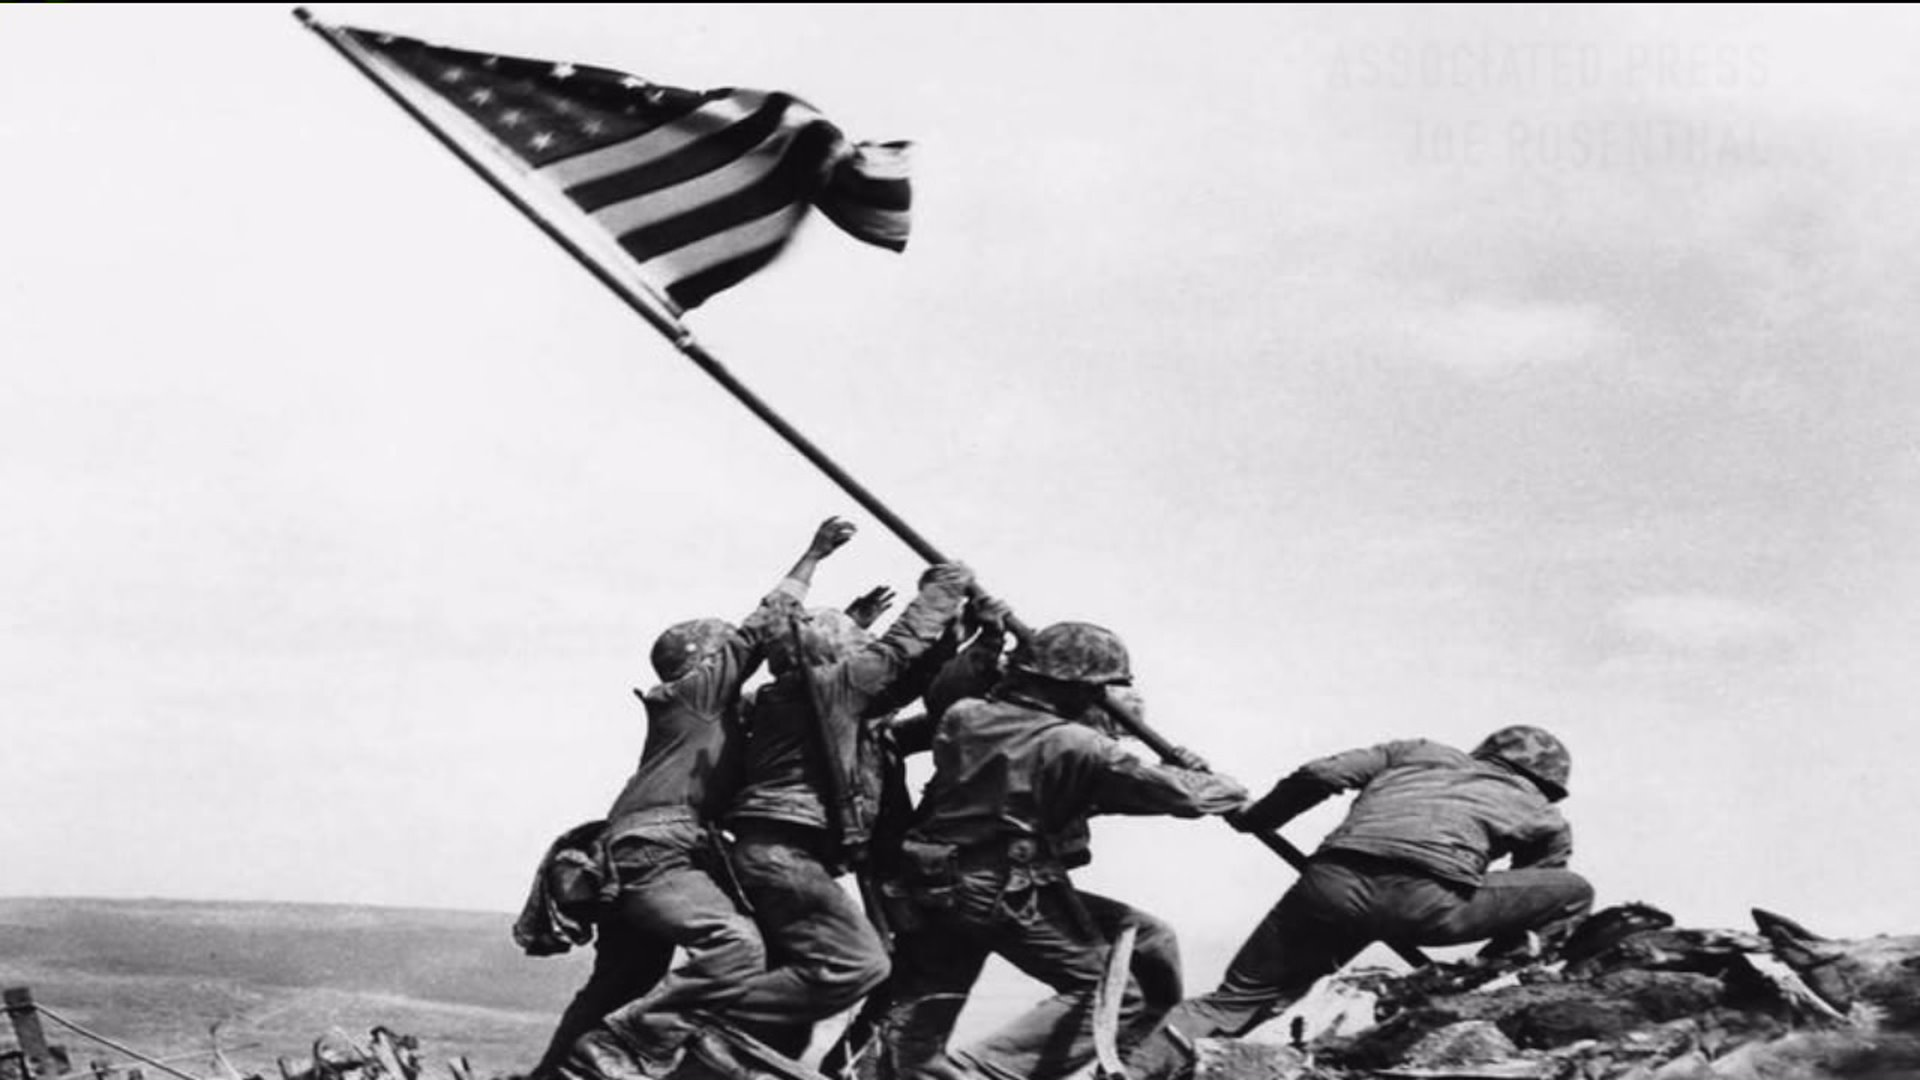 Colorado World War II vet in famous Iwo Jima flag-raising photo shares story | FOX31 Denver